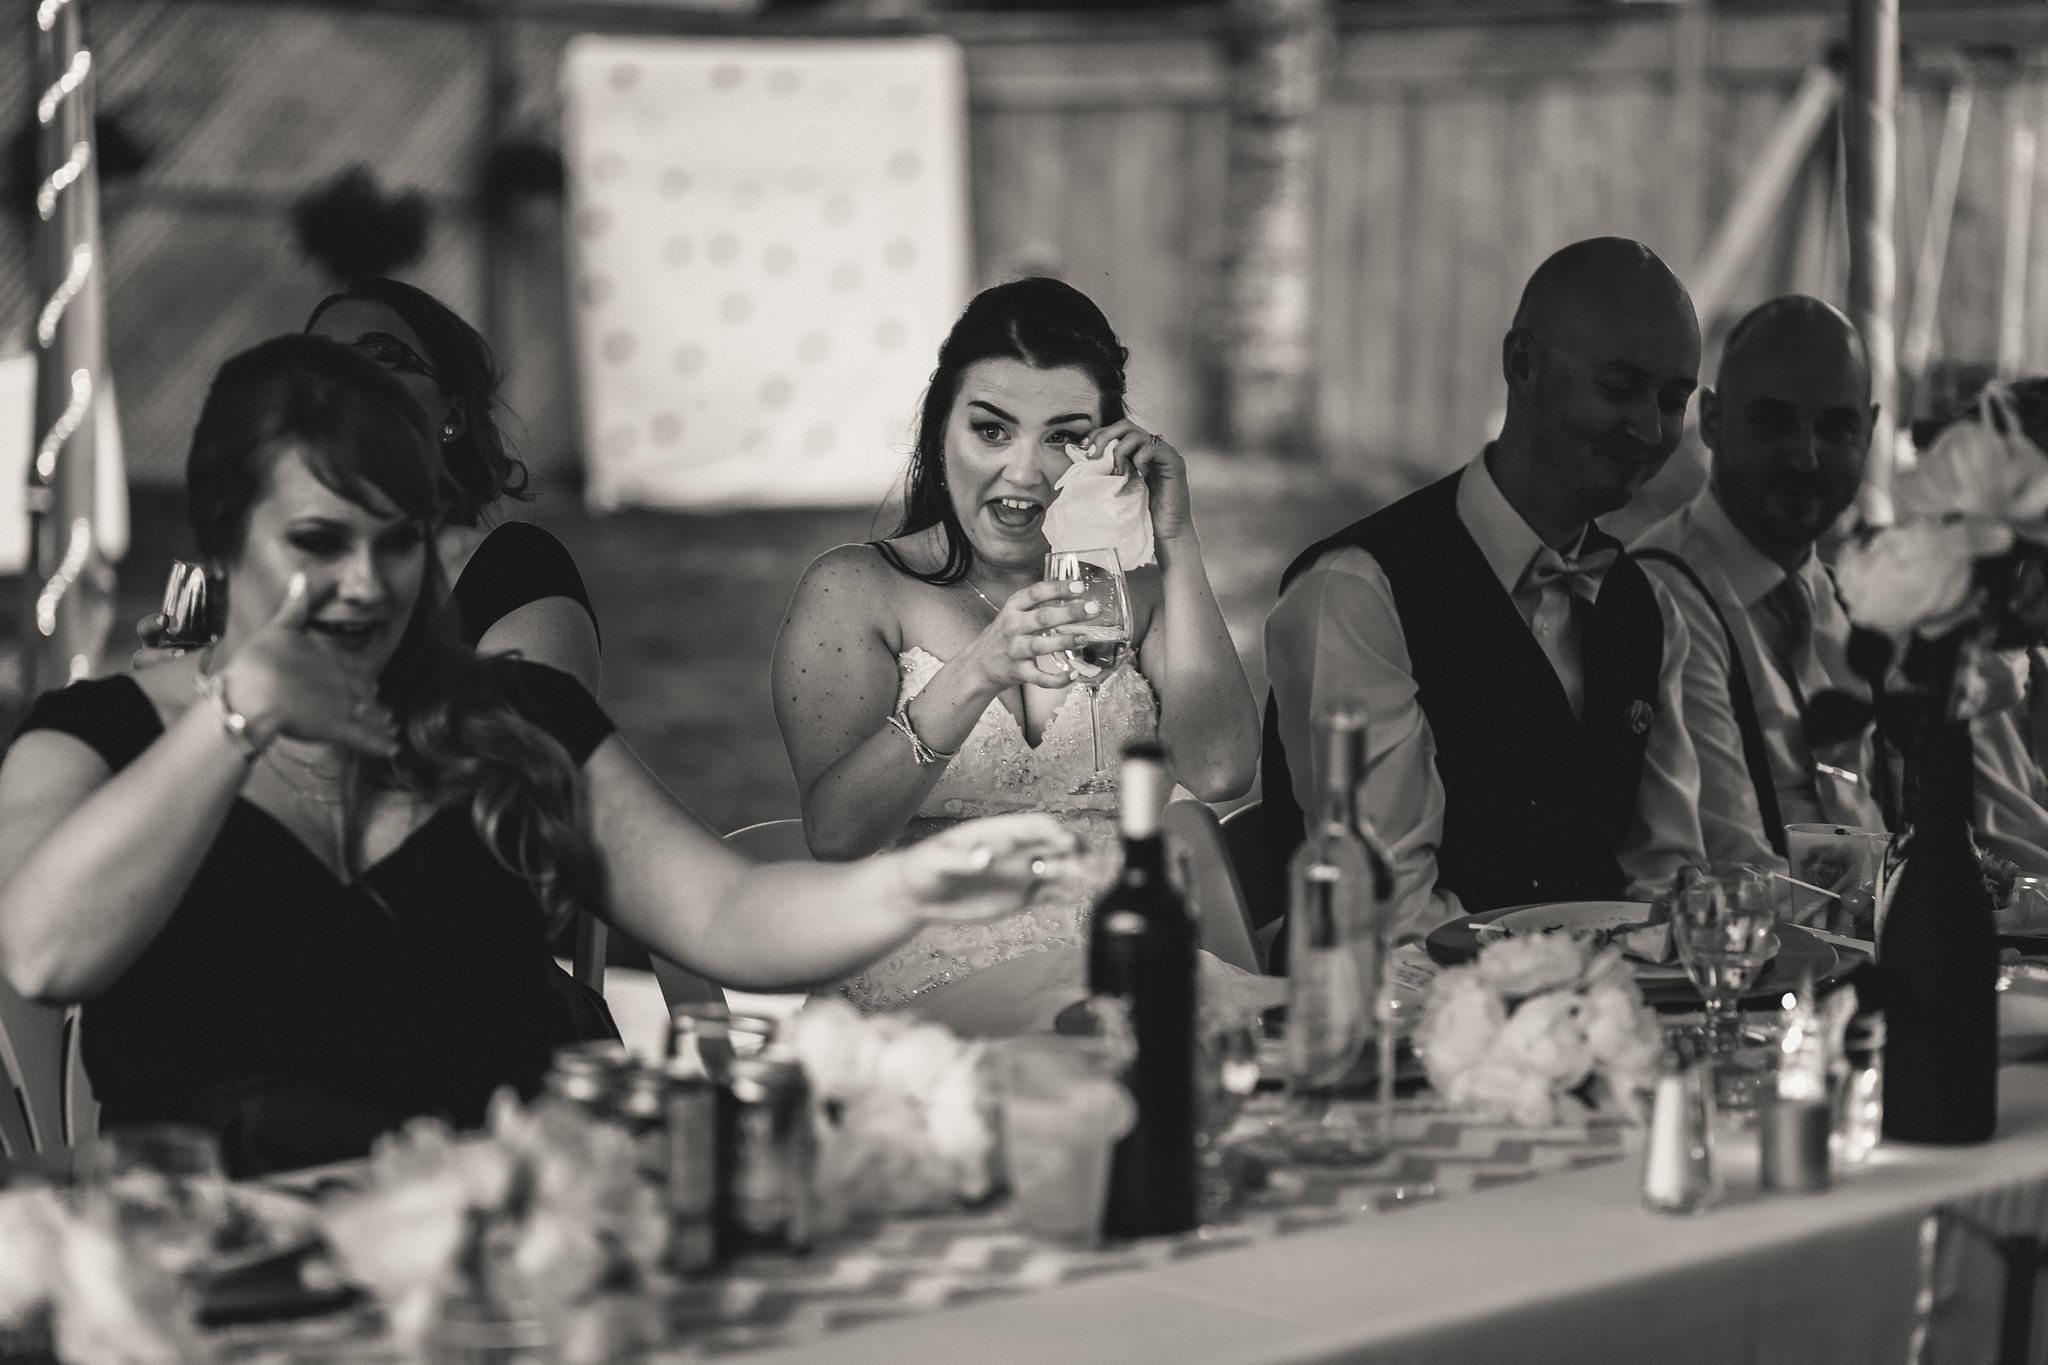 Kristen Adam Kindred Loft Whitby Wedding Photos 518 - Durham Wedding Photographer: Kindred Loft Wedding Photos